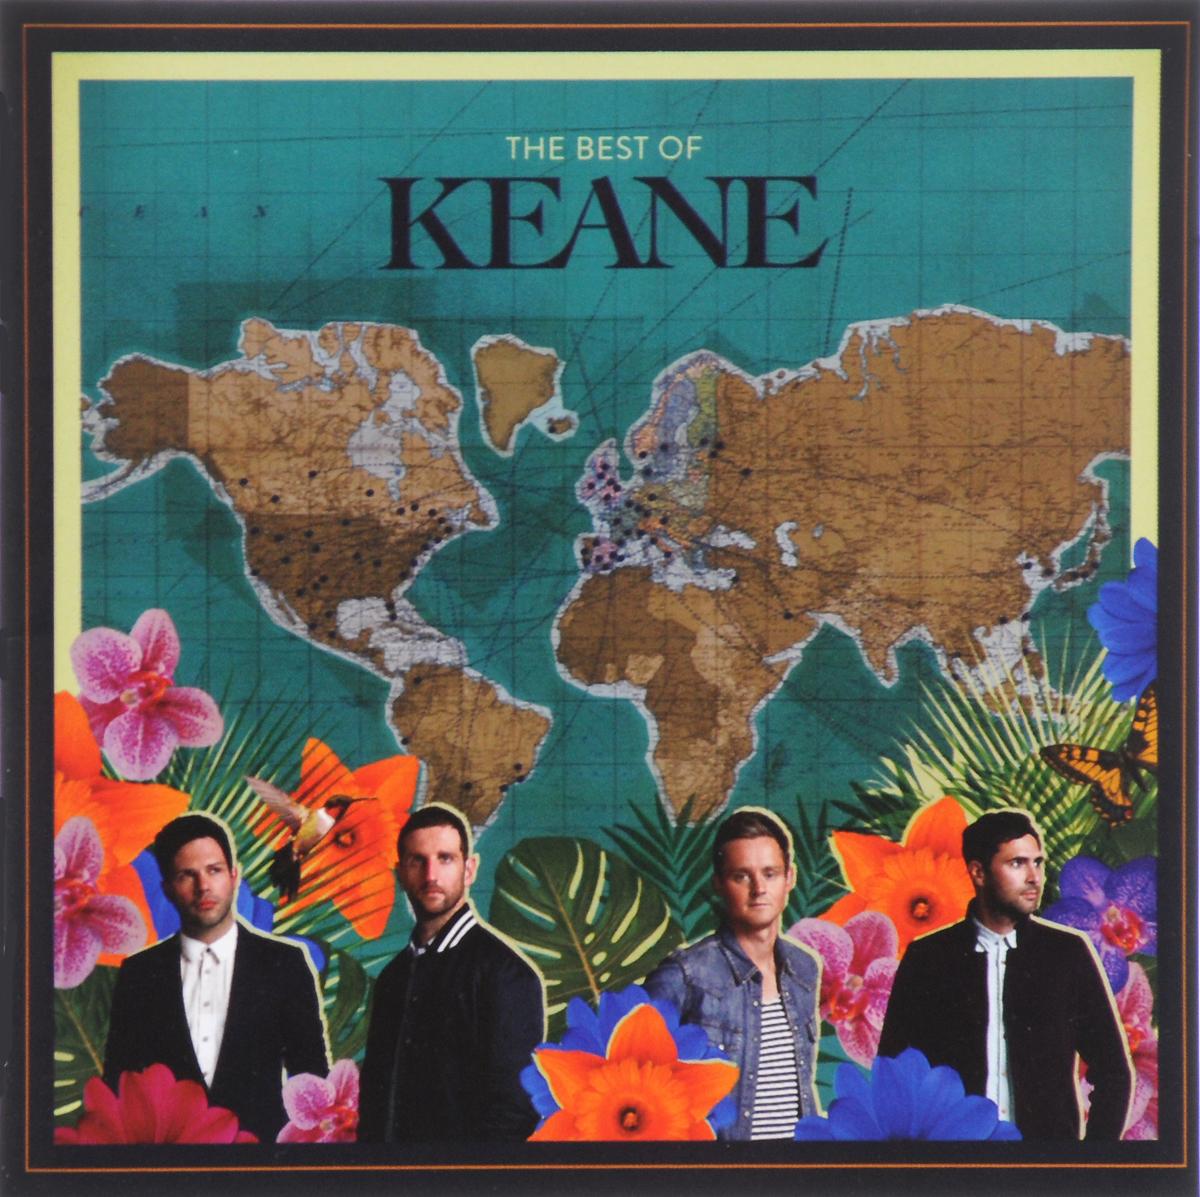 Keane Keane. The Best Of Keane david keane the art of deliberate success the 10 behaviours of successful people isbn 9781118487778